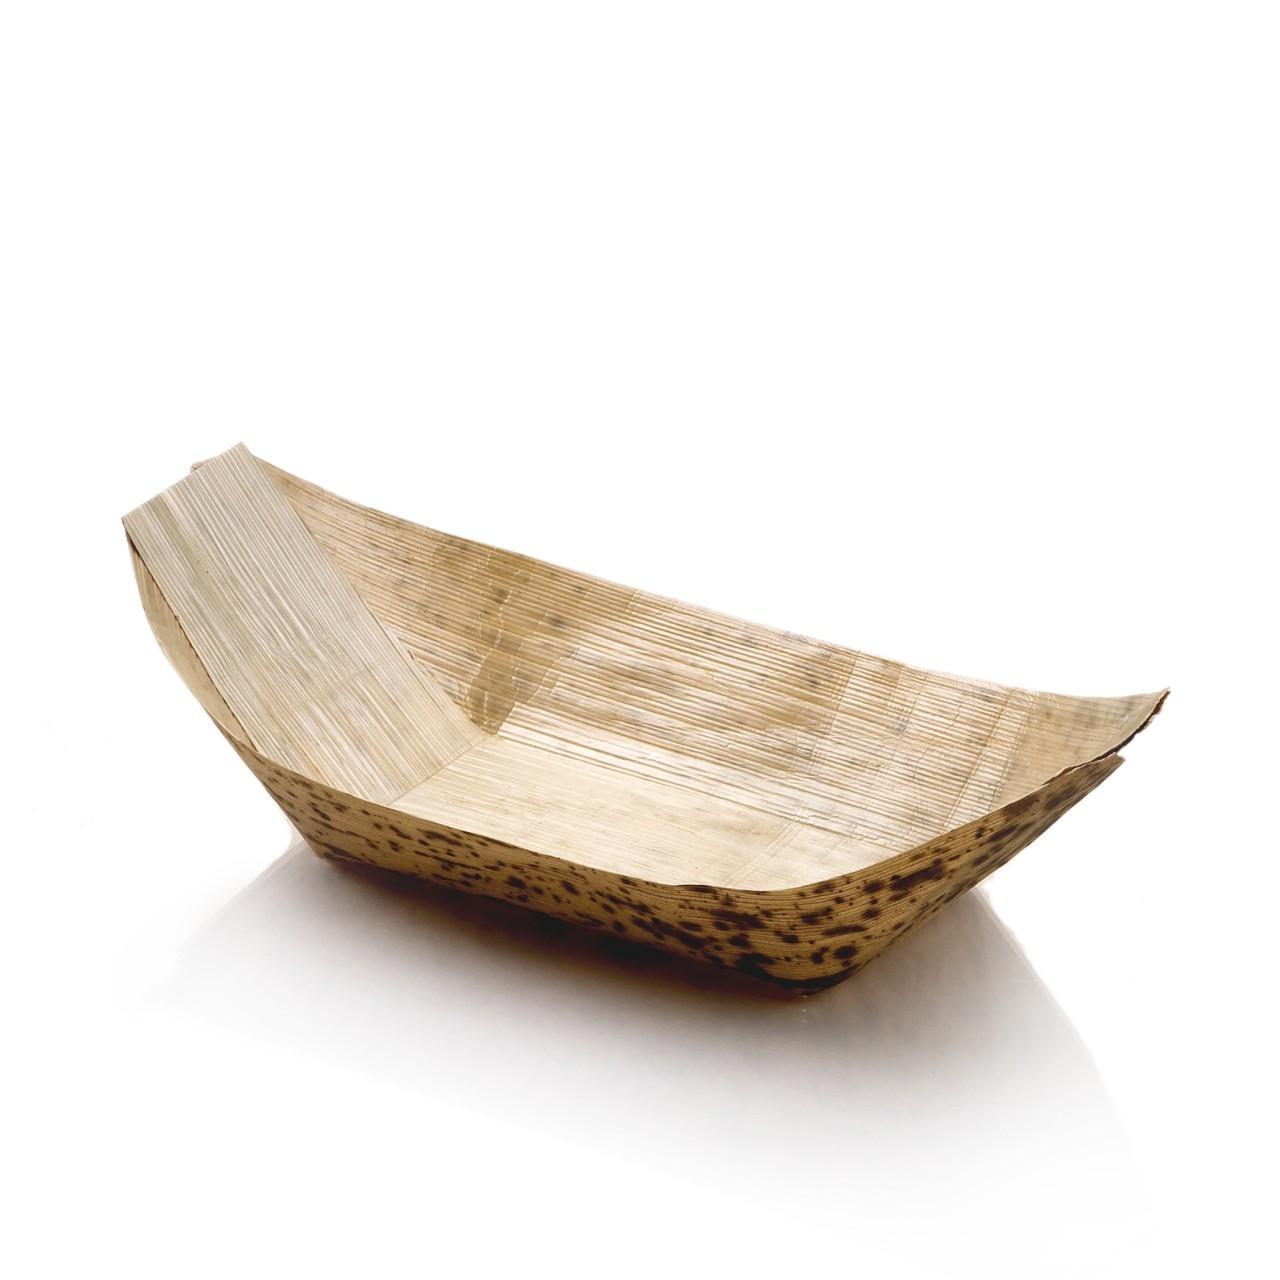 Bamboo Boats